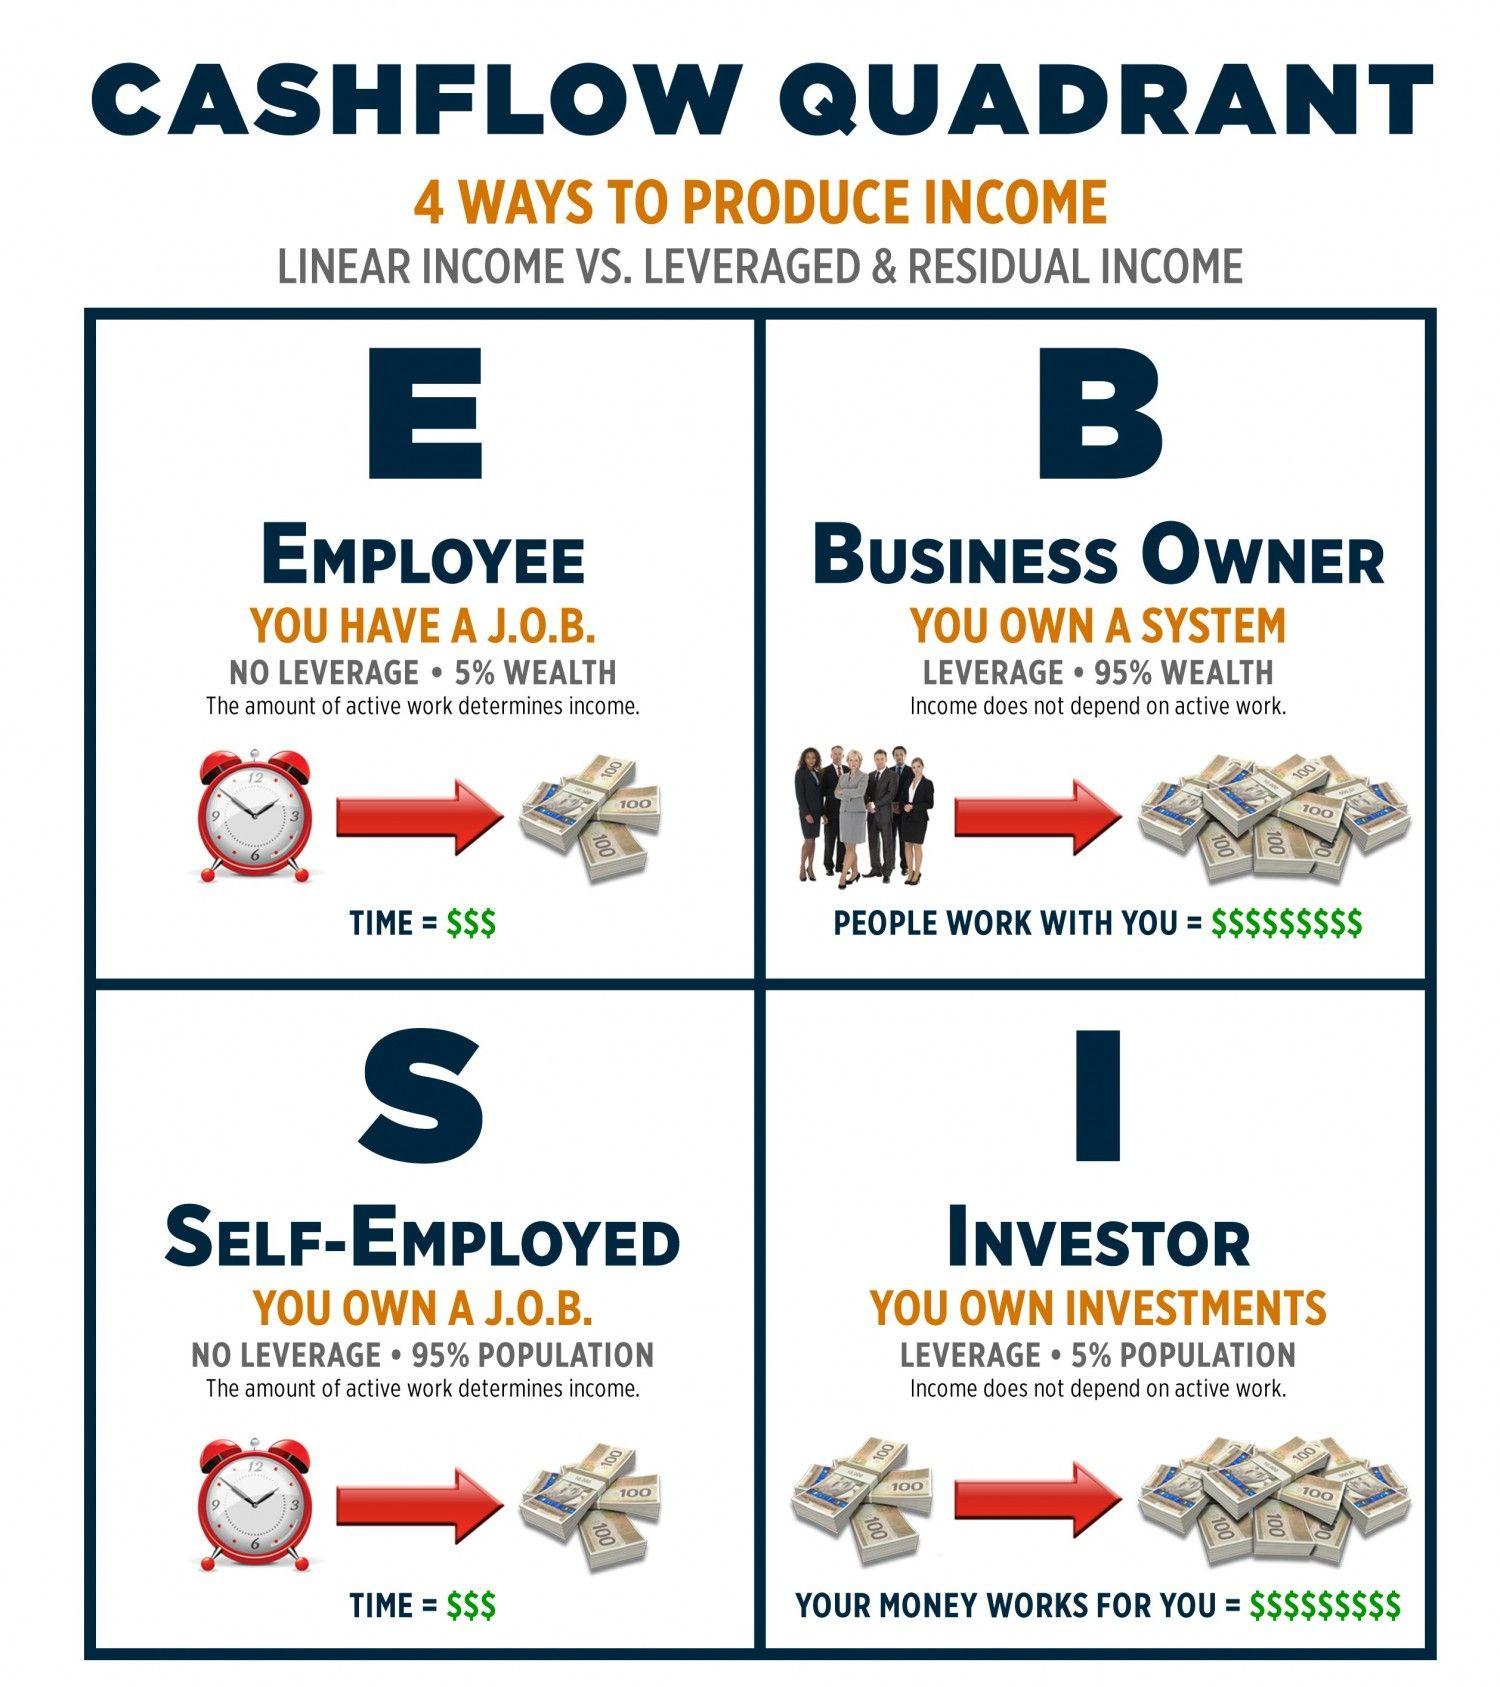 Cashflow Quadrant Which Quadrant Do You Fall In